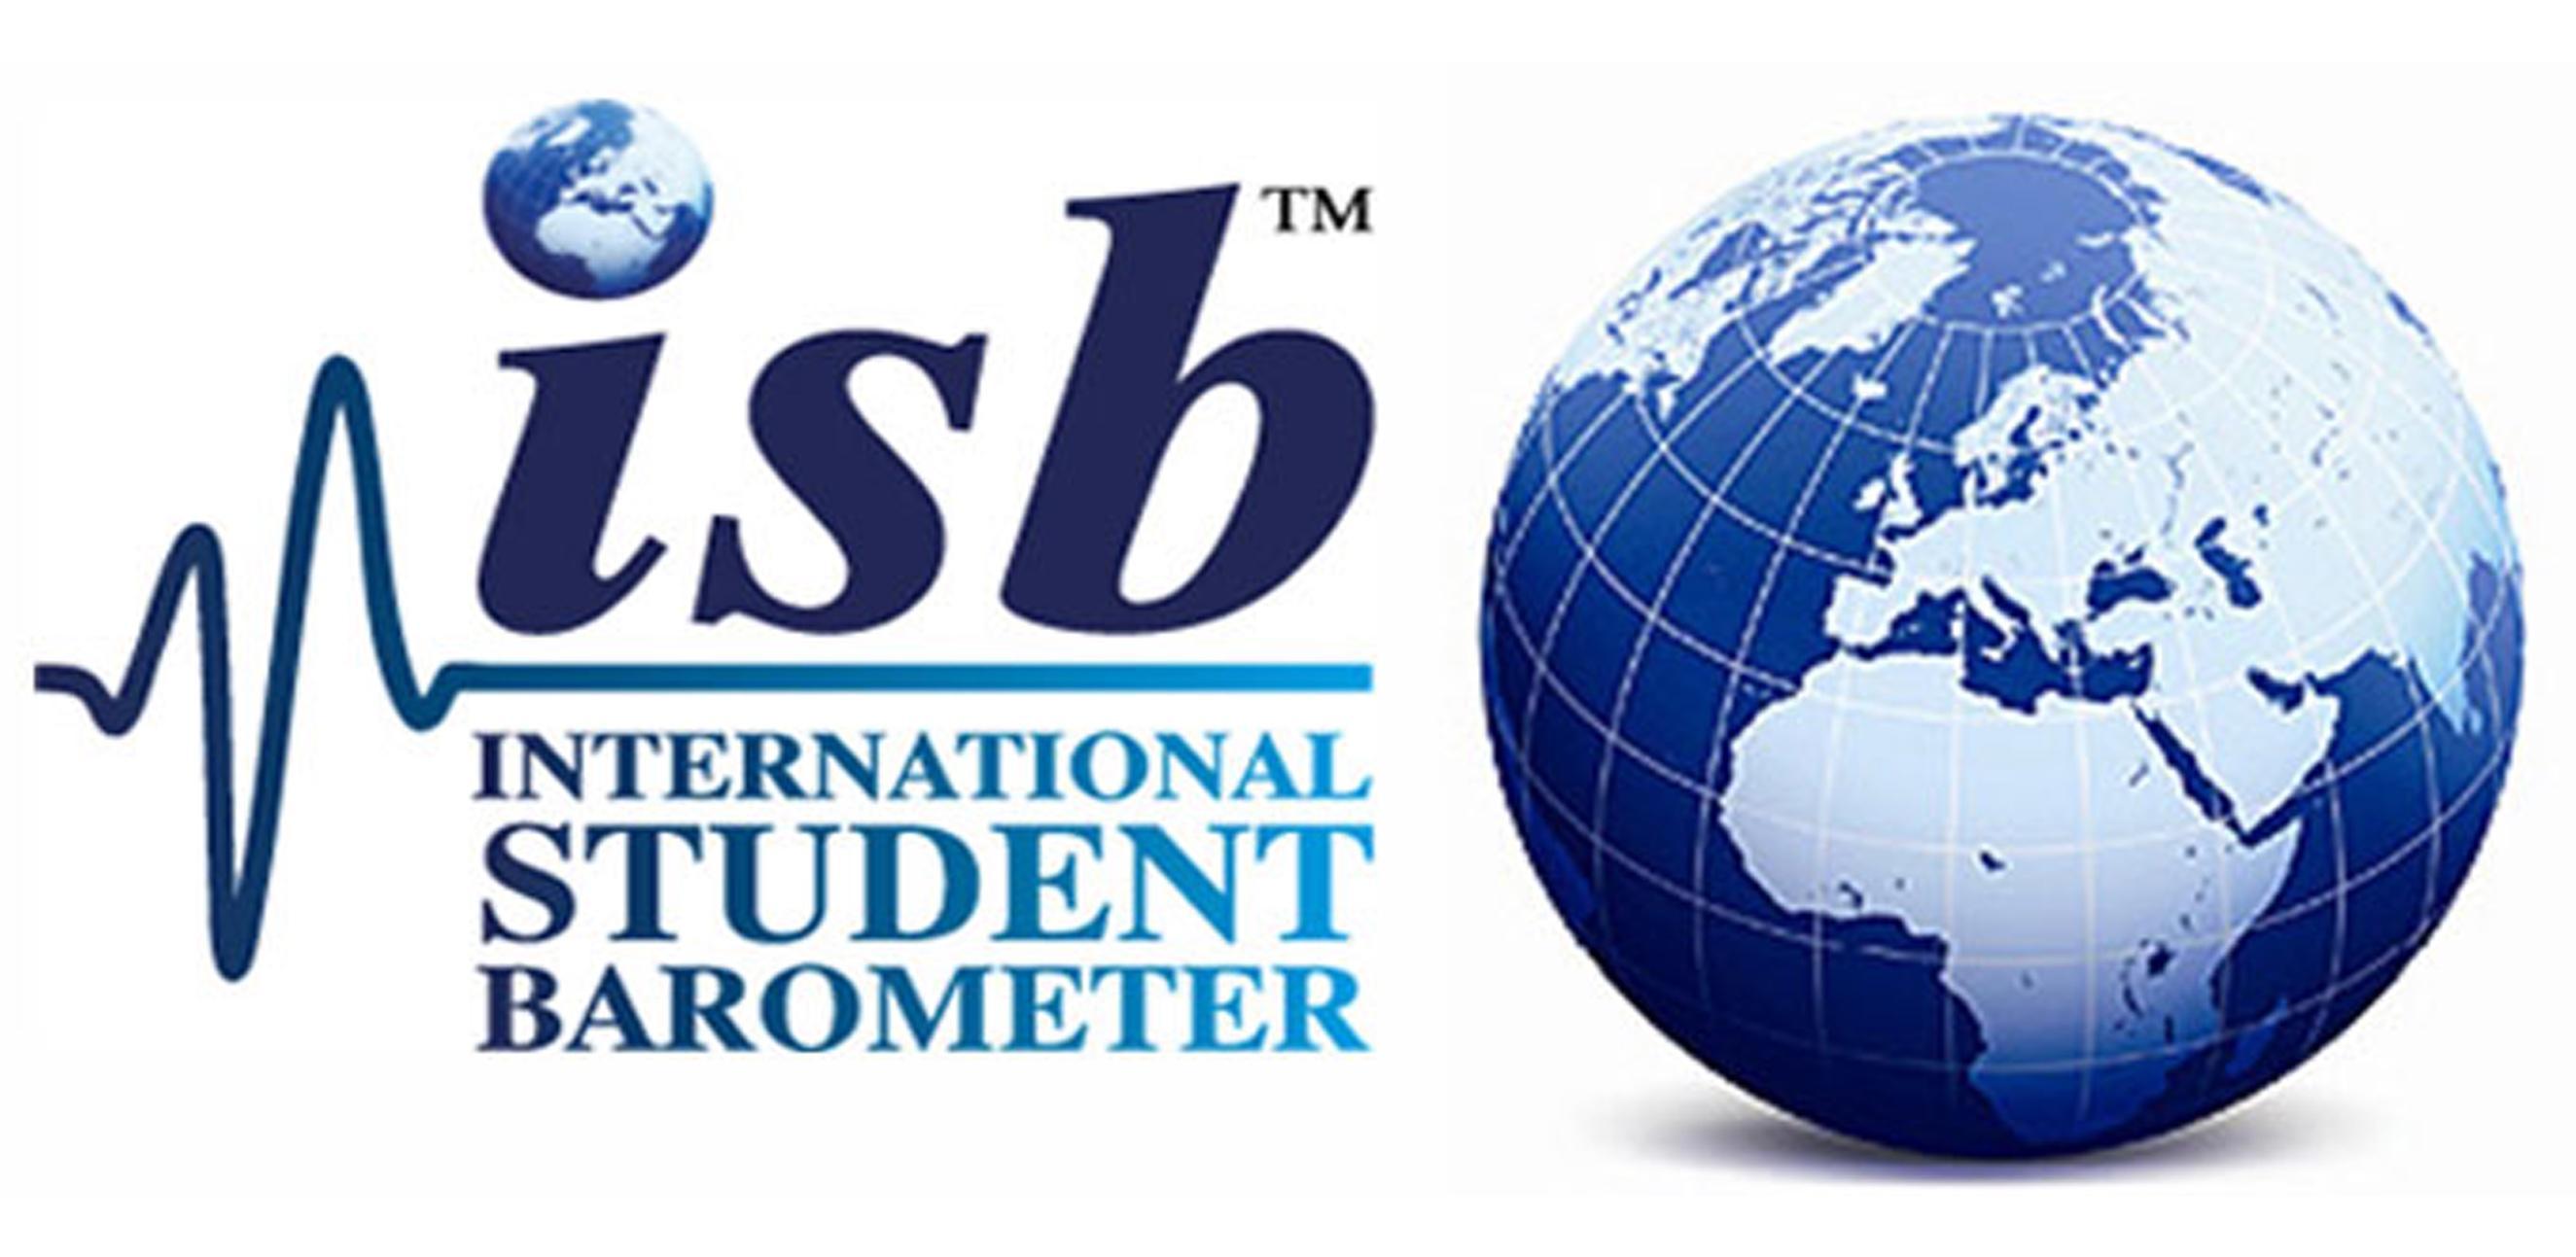 Student Barometer